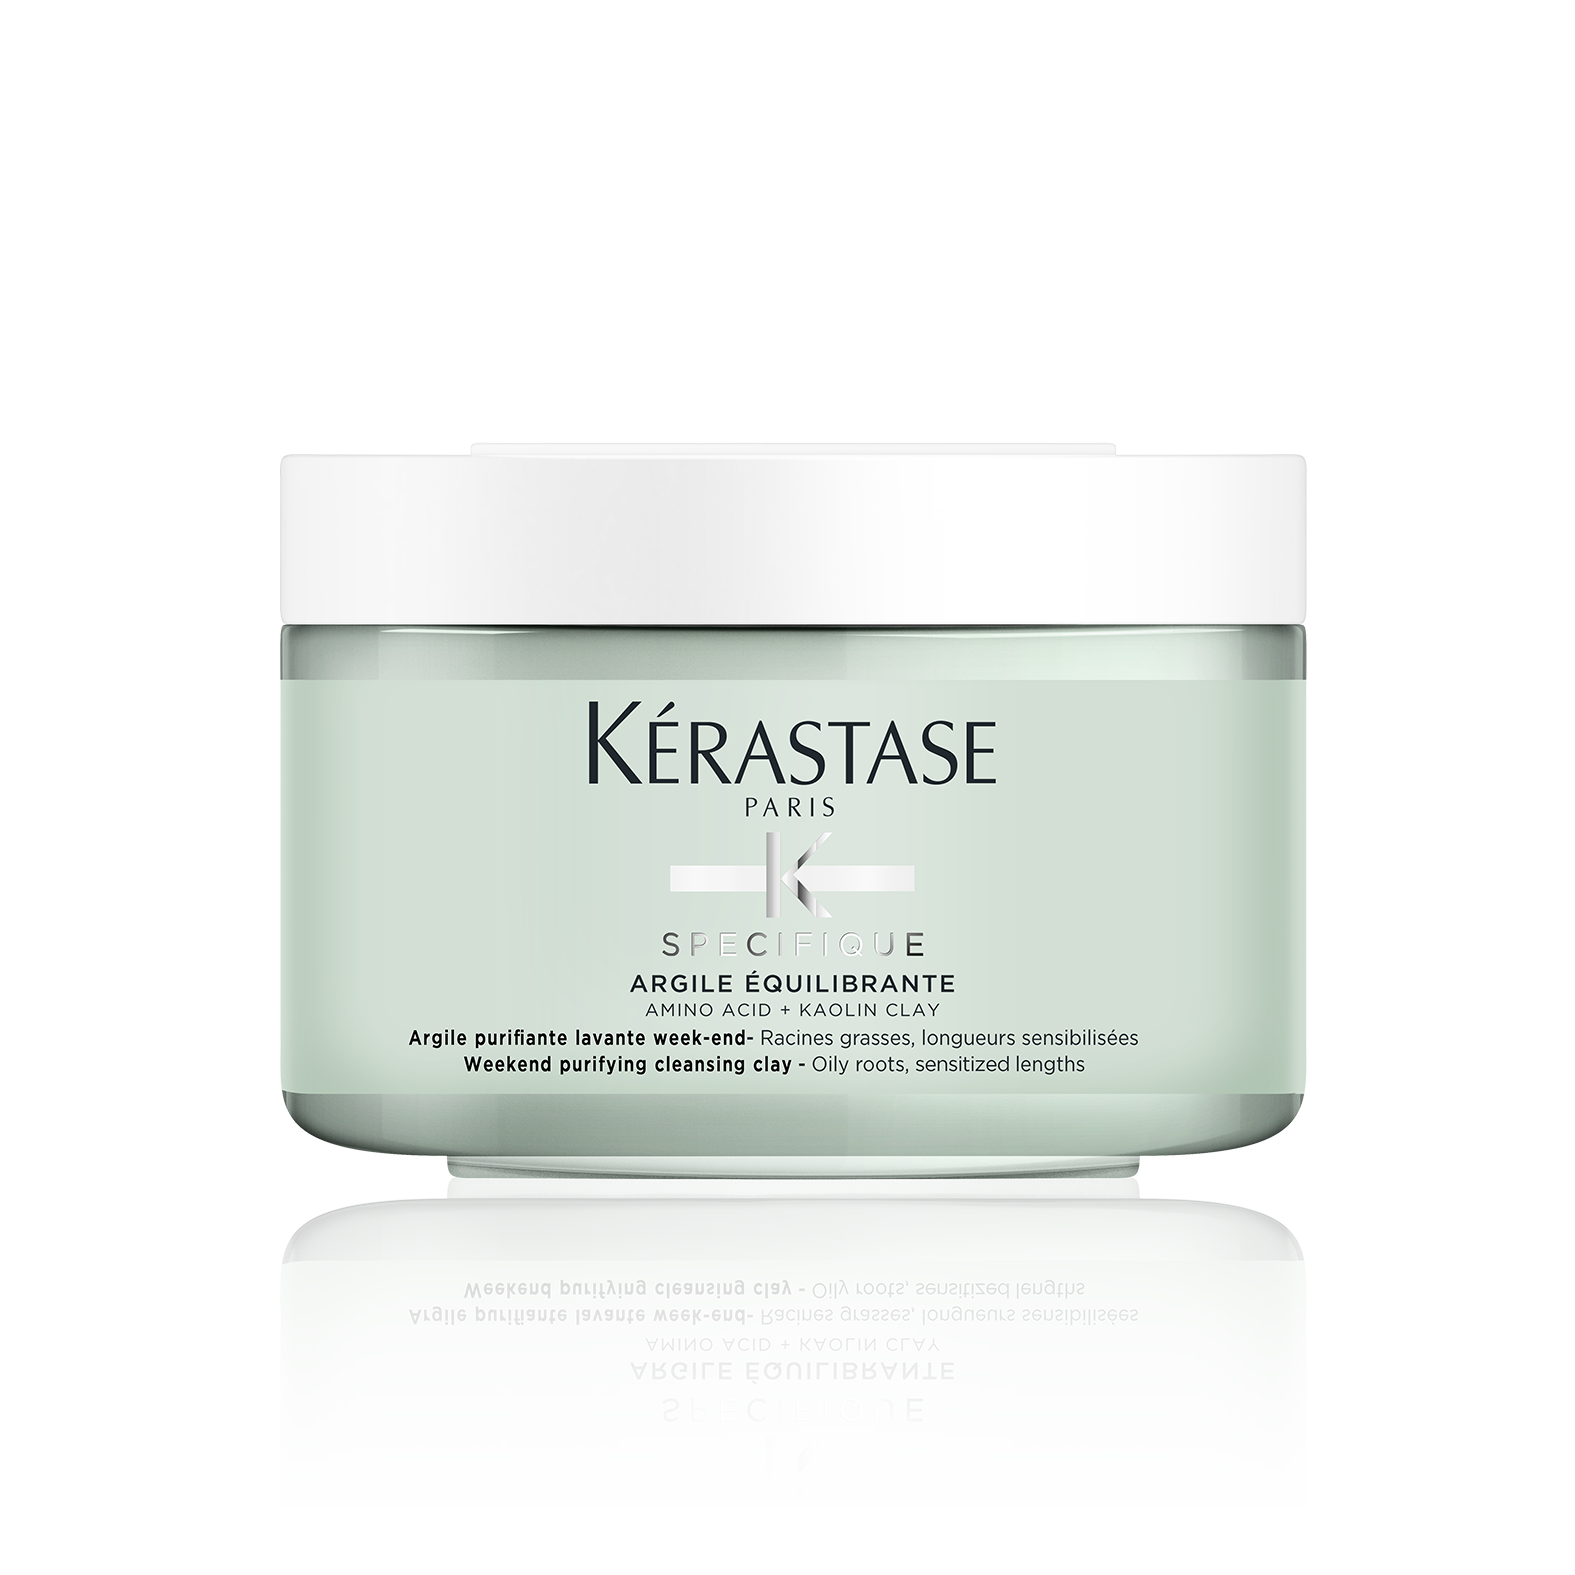 KERASTASE 21 - Specifique - Masque réhydratant